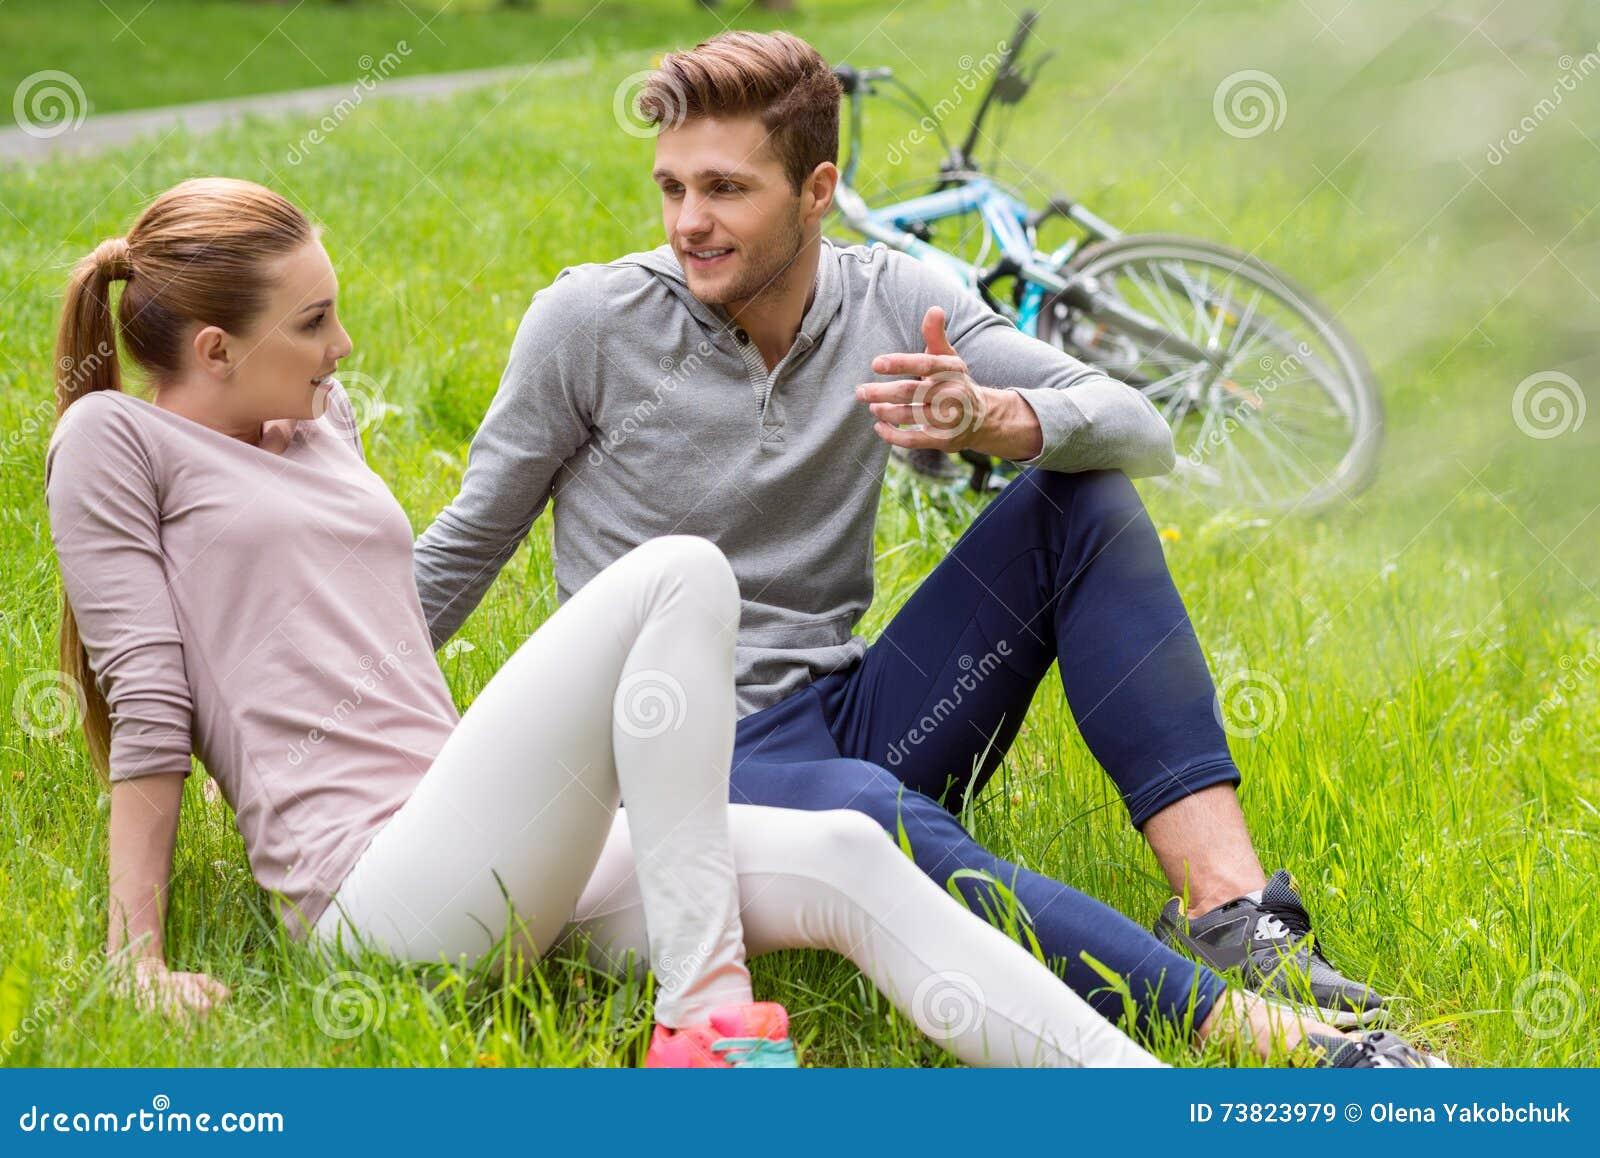 dating sites usa top